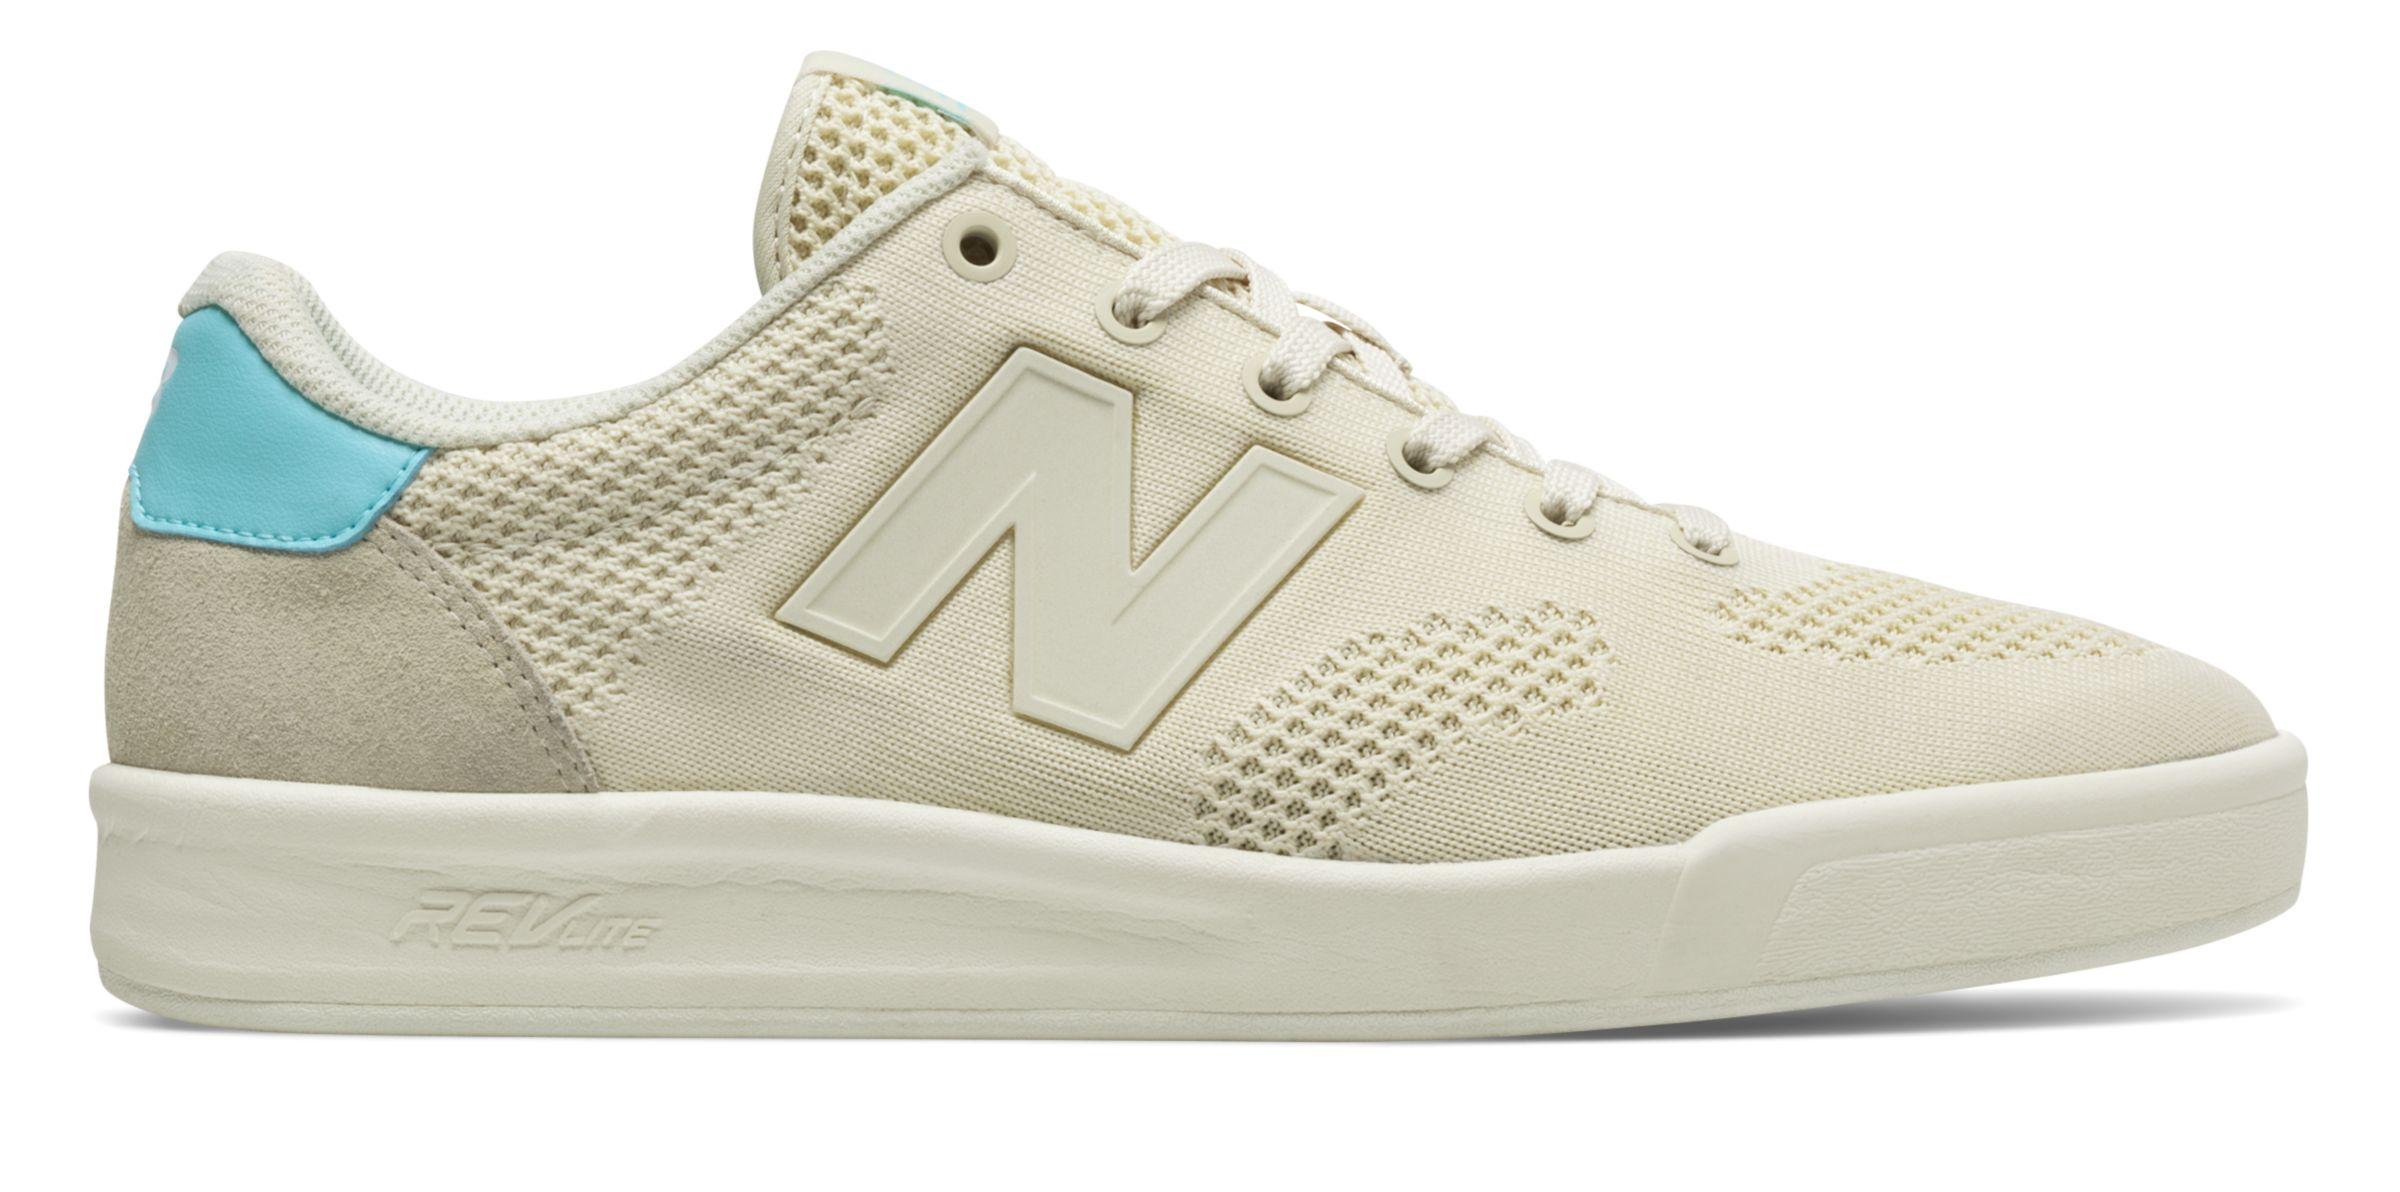 15ce862dbd2e6 New Balance Male Men's 300 Adult Lifestyle Shoes Stylish Tan With ...